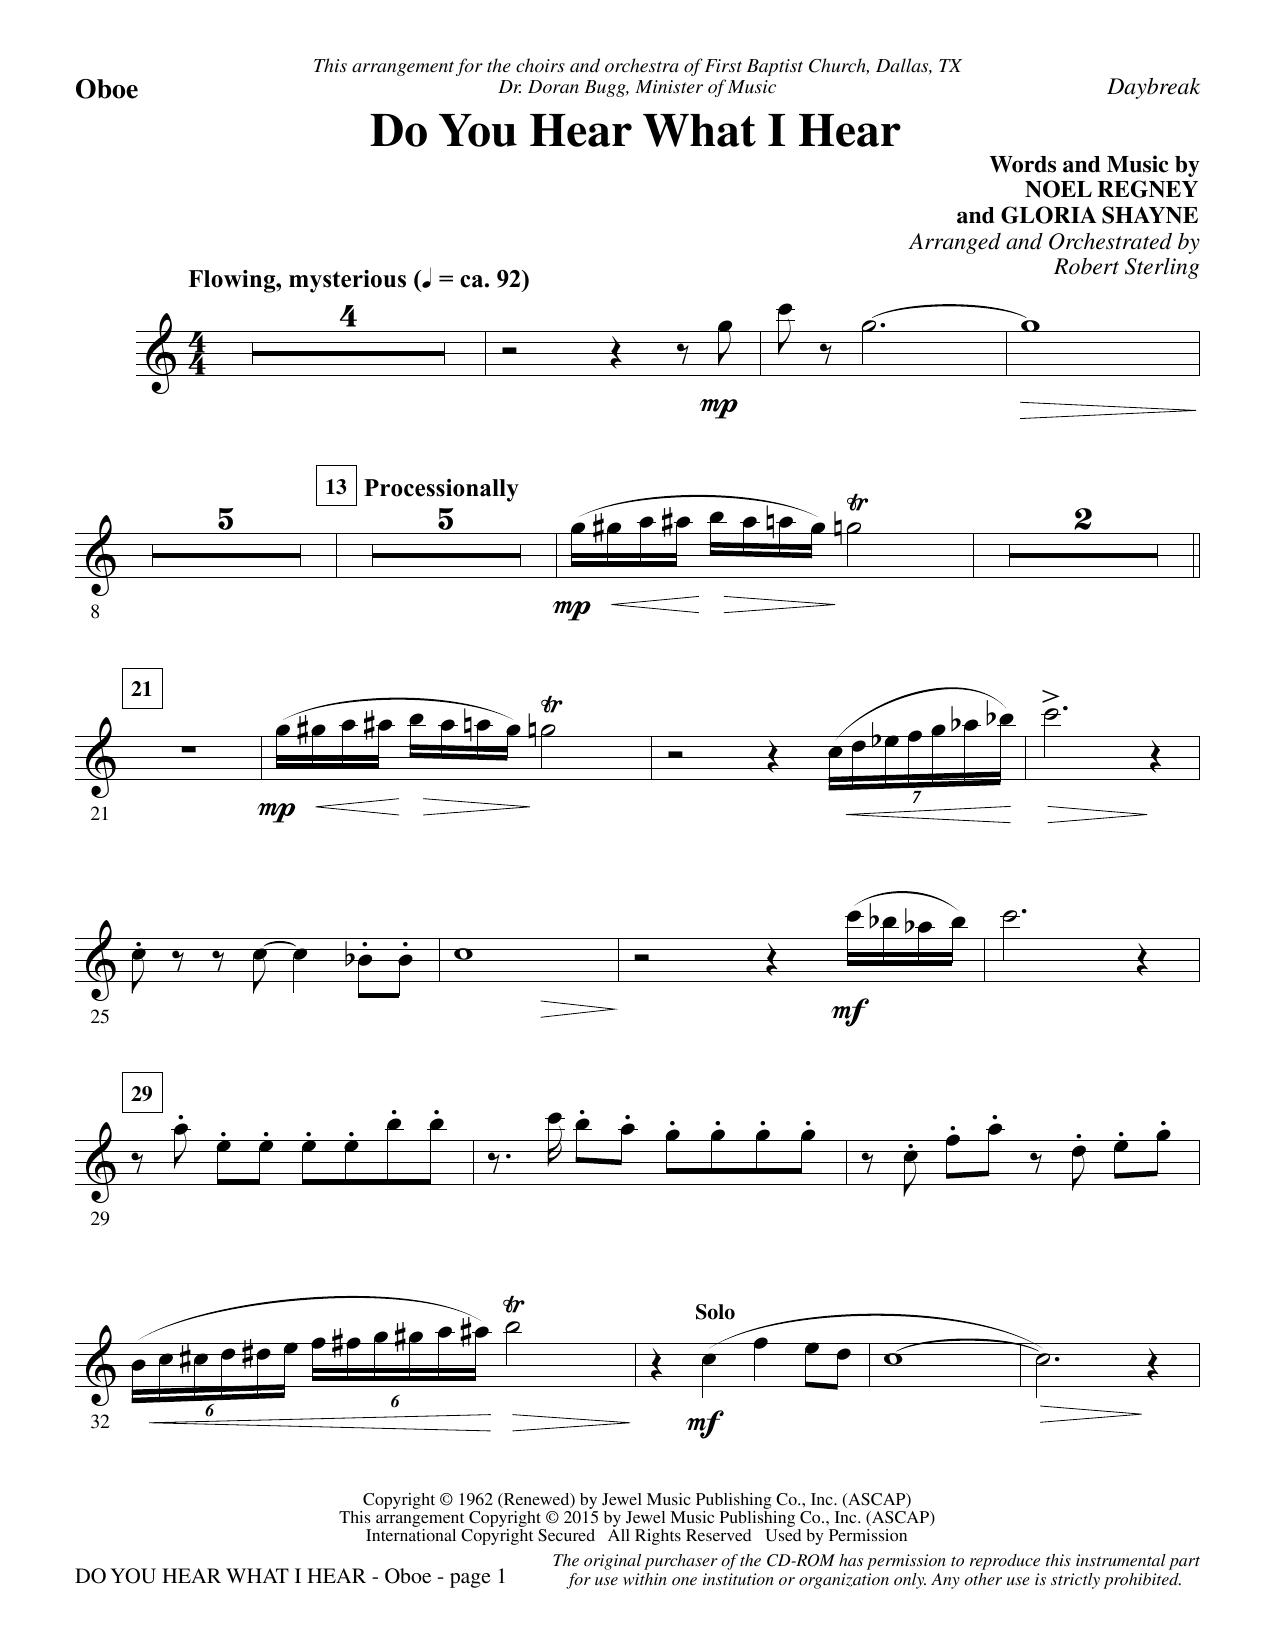 Do You Hear What I Hear - Oboe Sheet Music